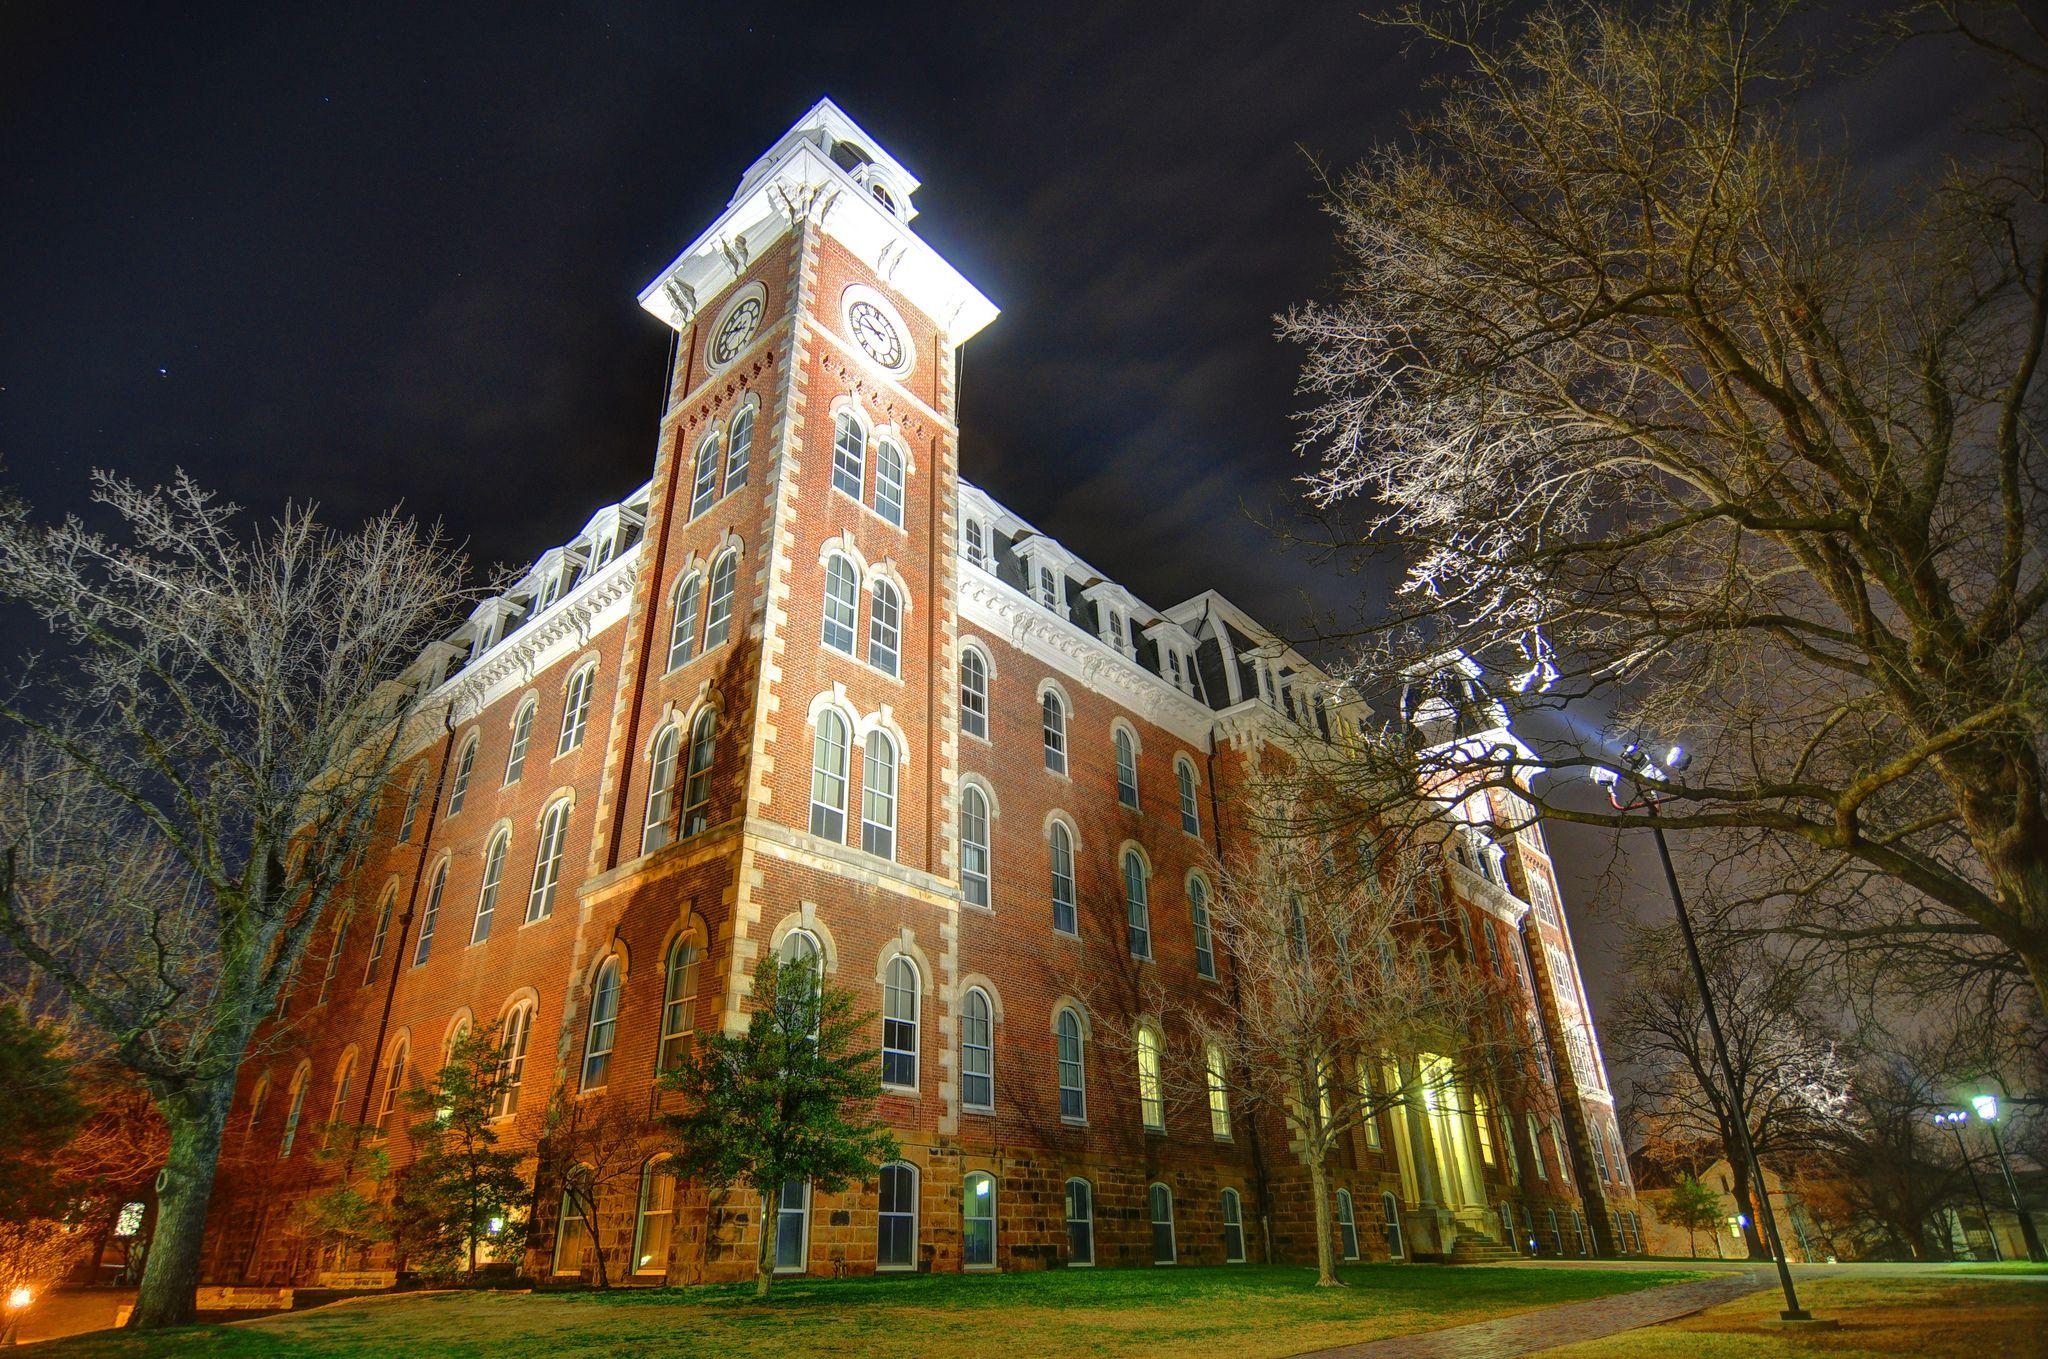 University Of Arkansas Admissions >> University of Arkansas: Acceptance Rate, SAT/ACT Scores, GPA